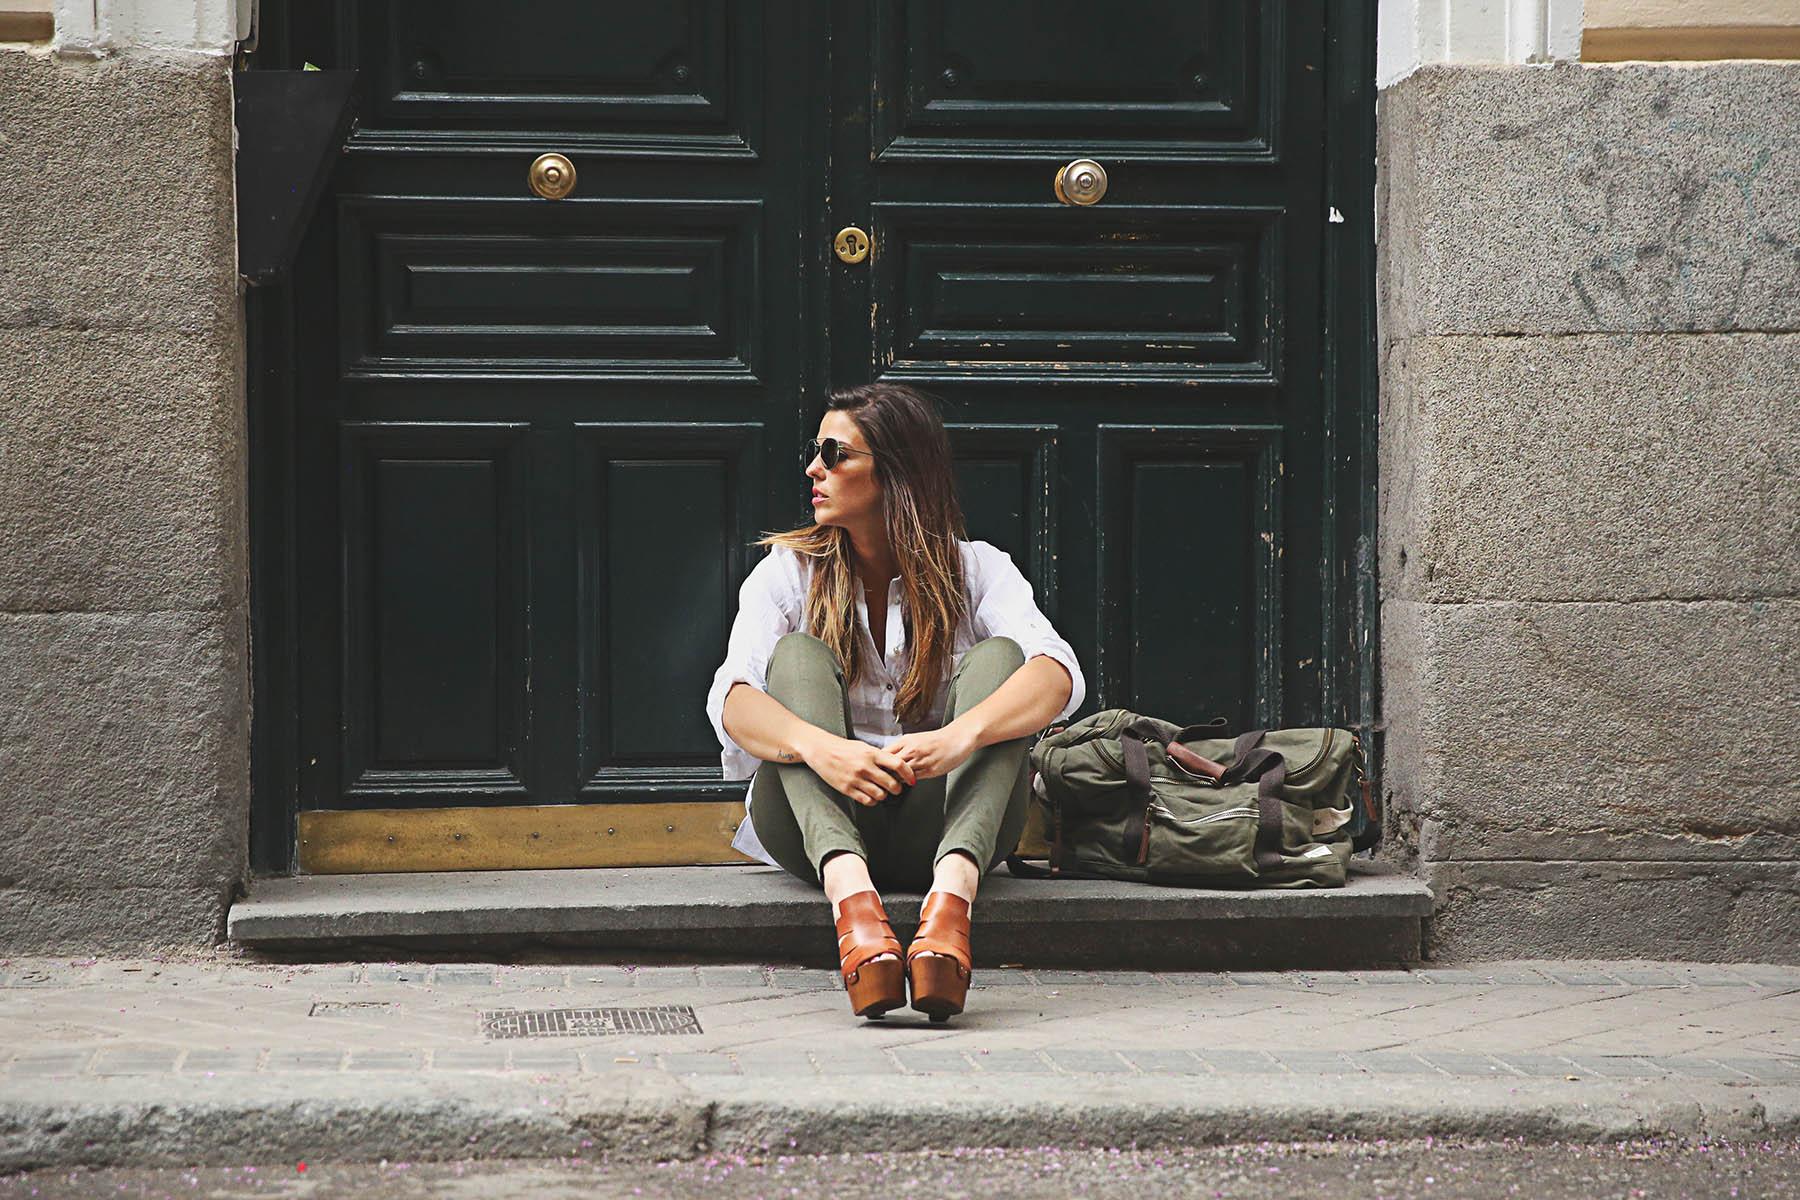 trendy-taste-look-outfit-street-style-steve-madden-ootd-blog-blogger-fashion-spain-moda-españa-safari-traveling-viaje-bolsa-bag-khaki-caqui-pants-sandalias-zuecos-5